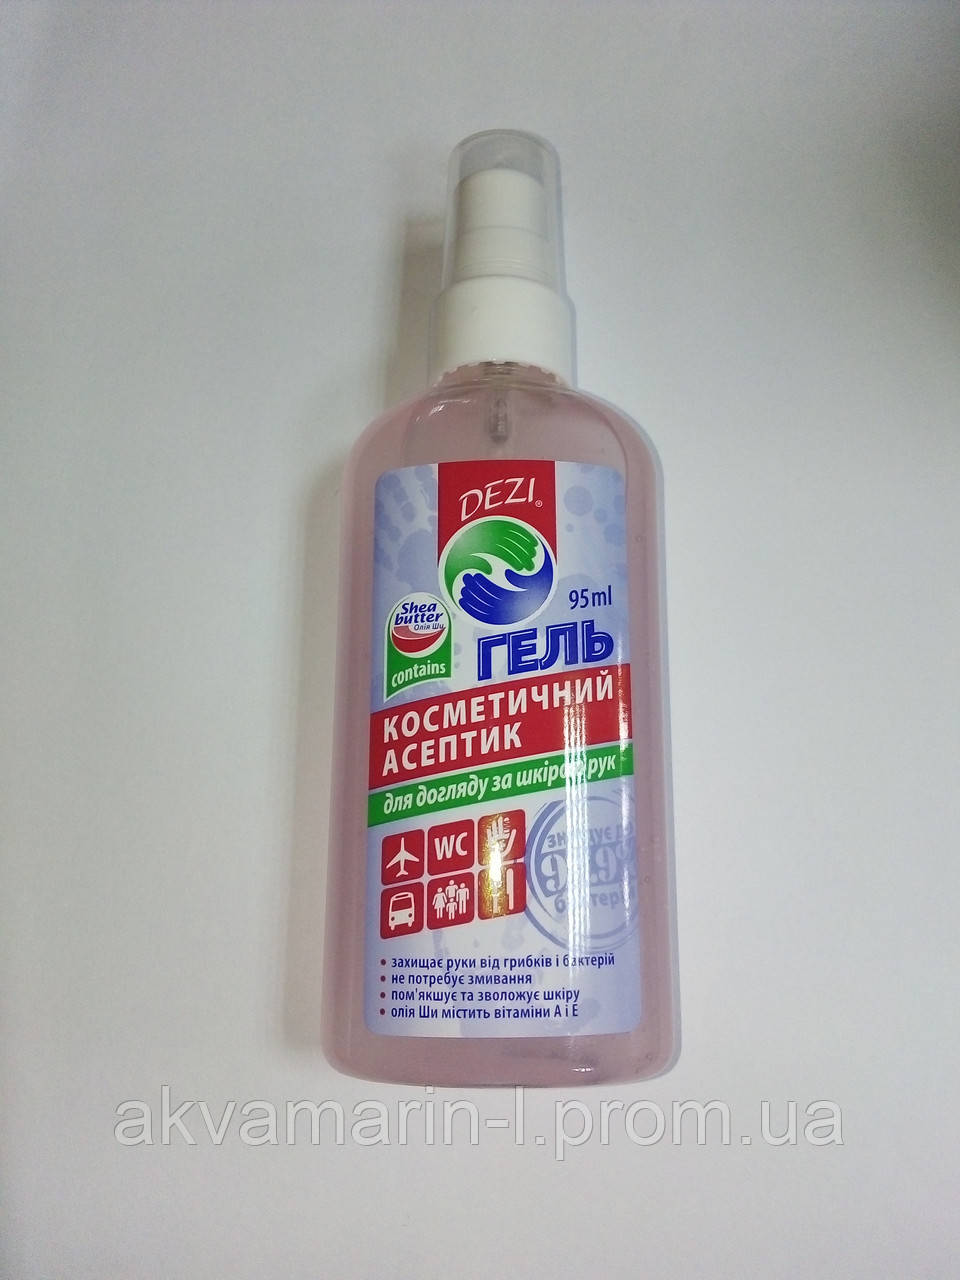 Гель  DEZI/ДЕЗИ косметический антисептик для рук, 95 мл